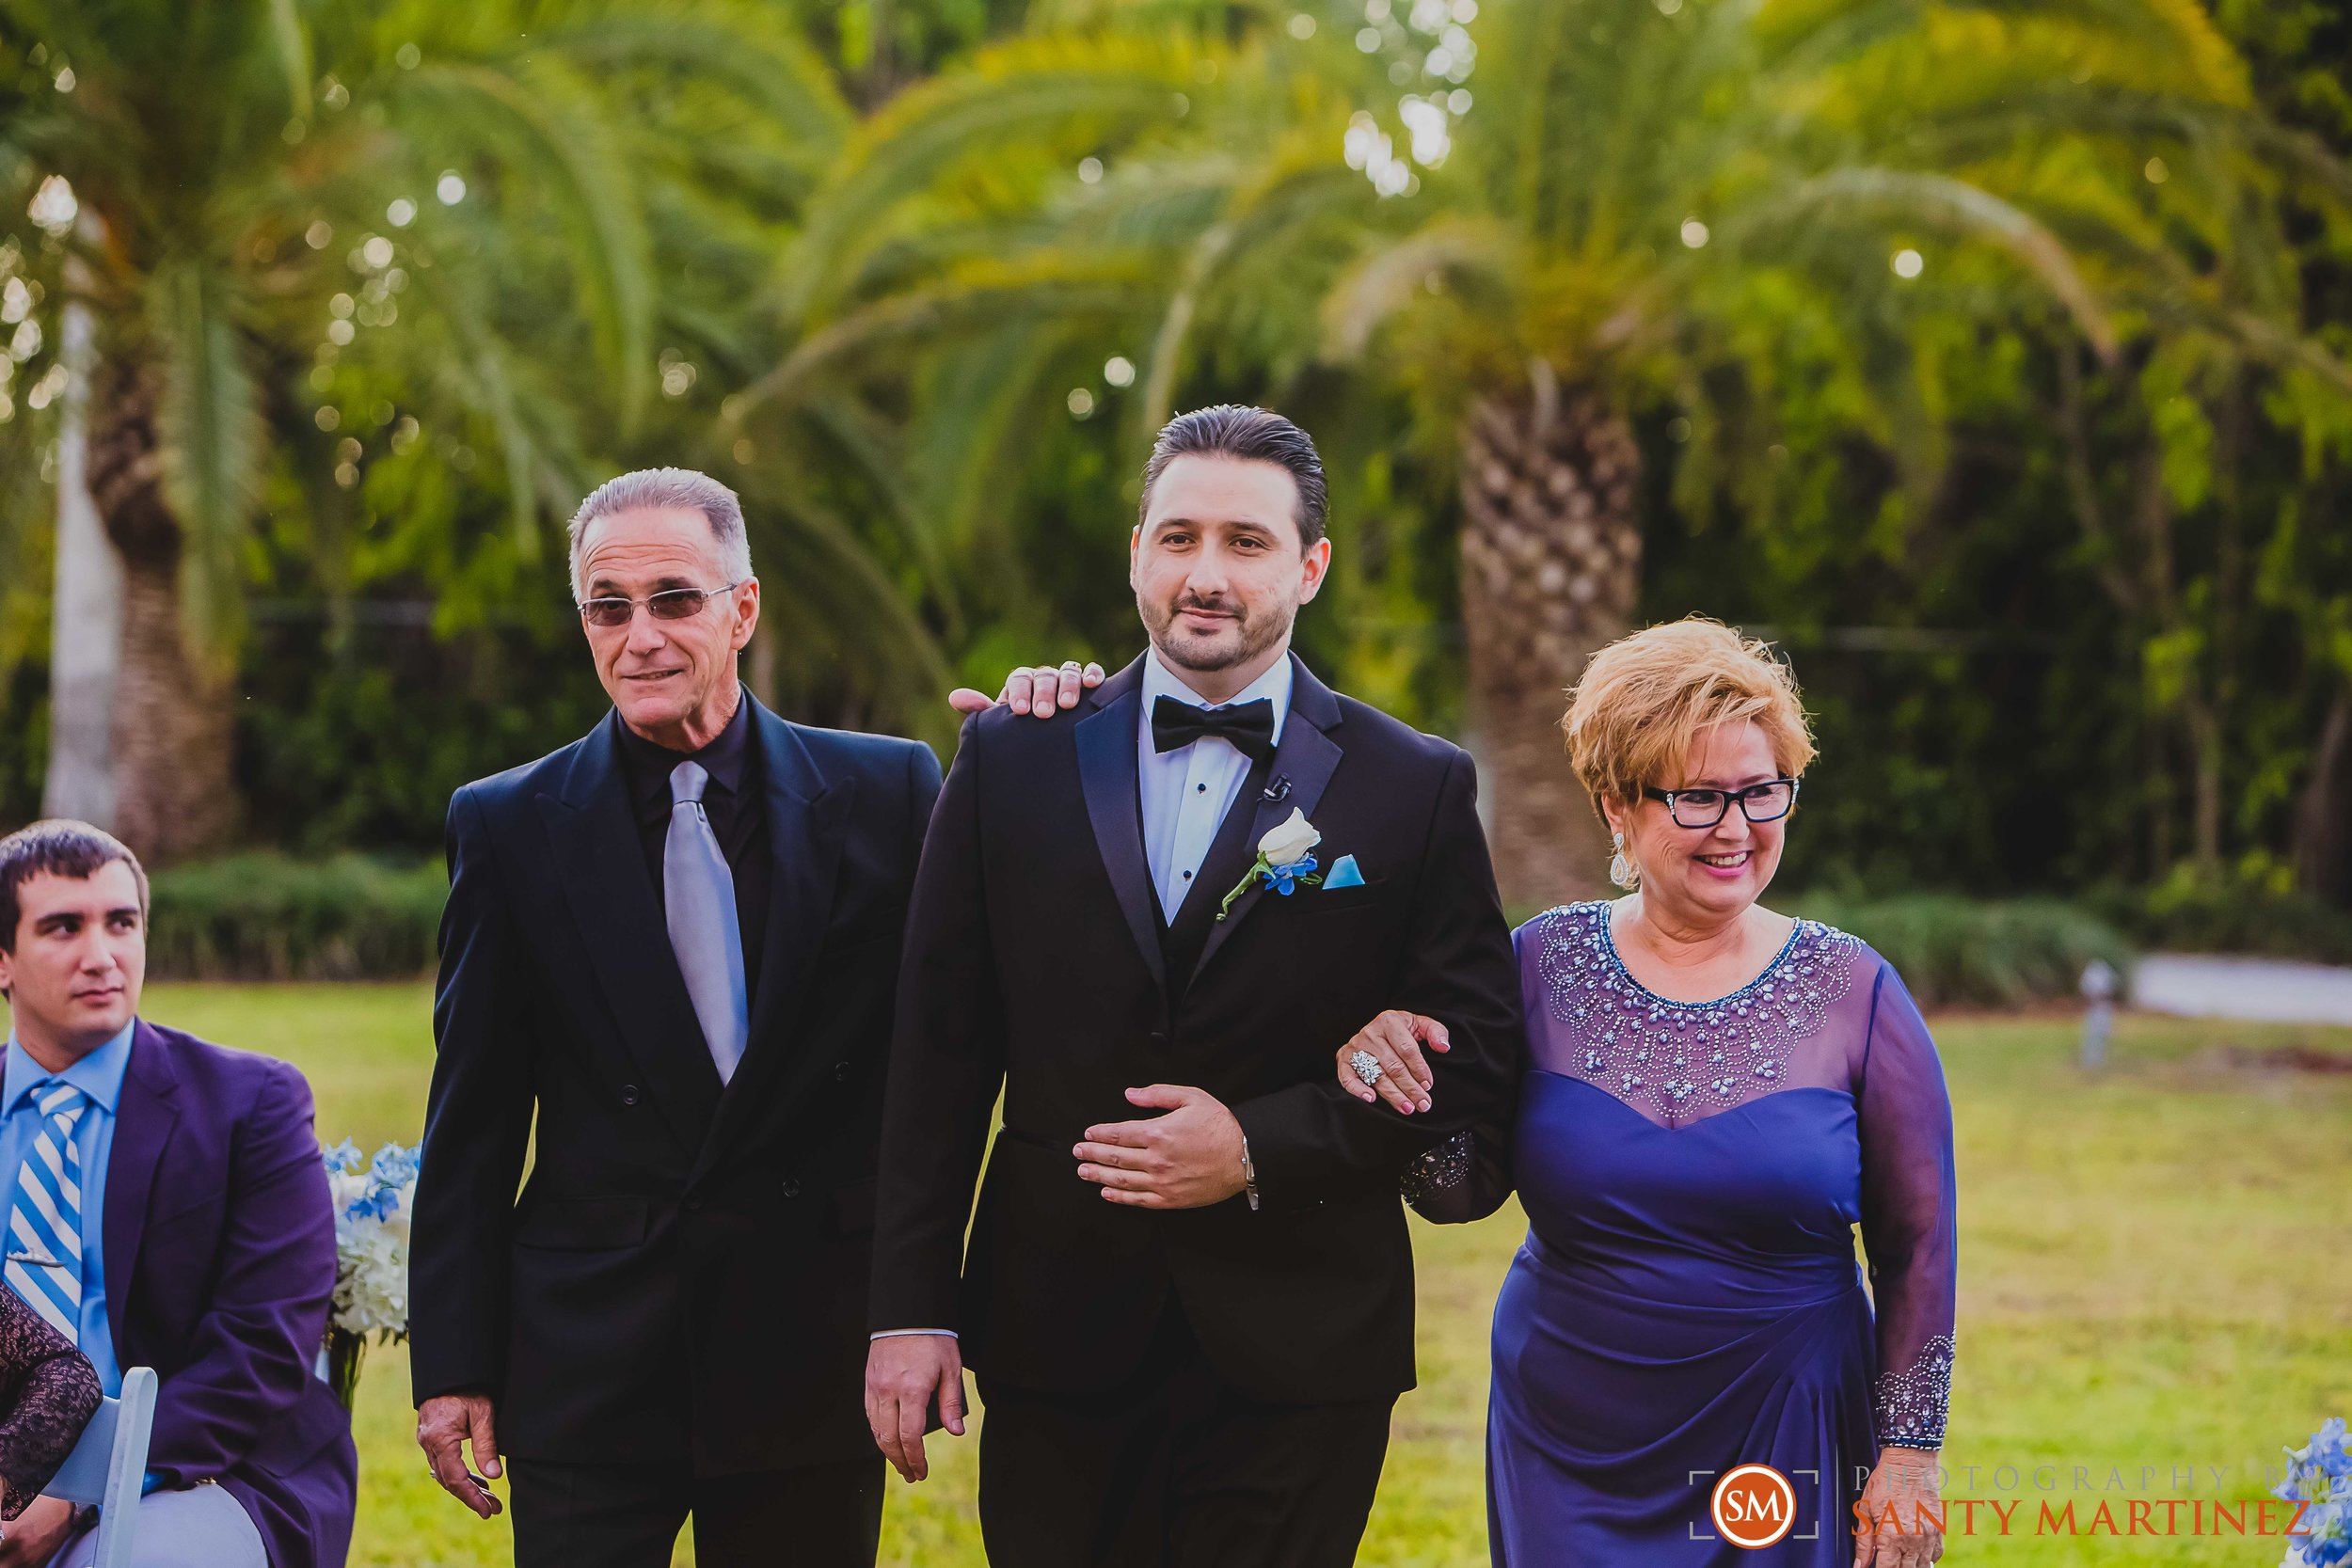 Wedding - Whimsical key West House - Photography by Santy Martinez-14.jpg